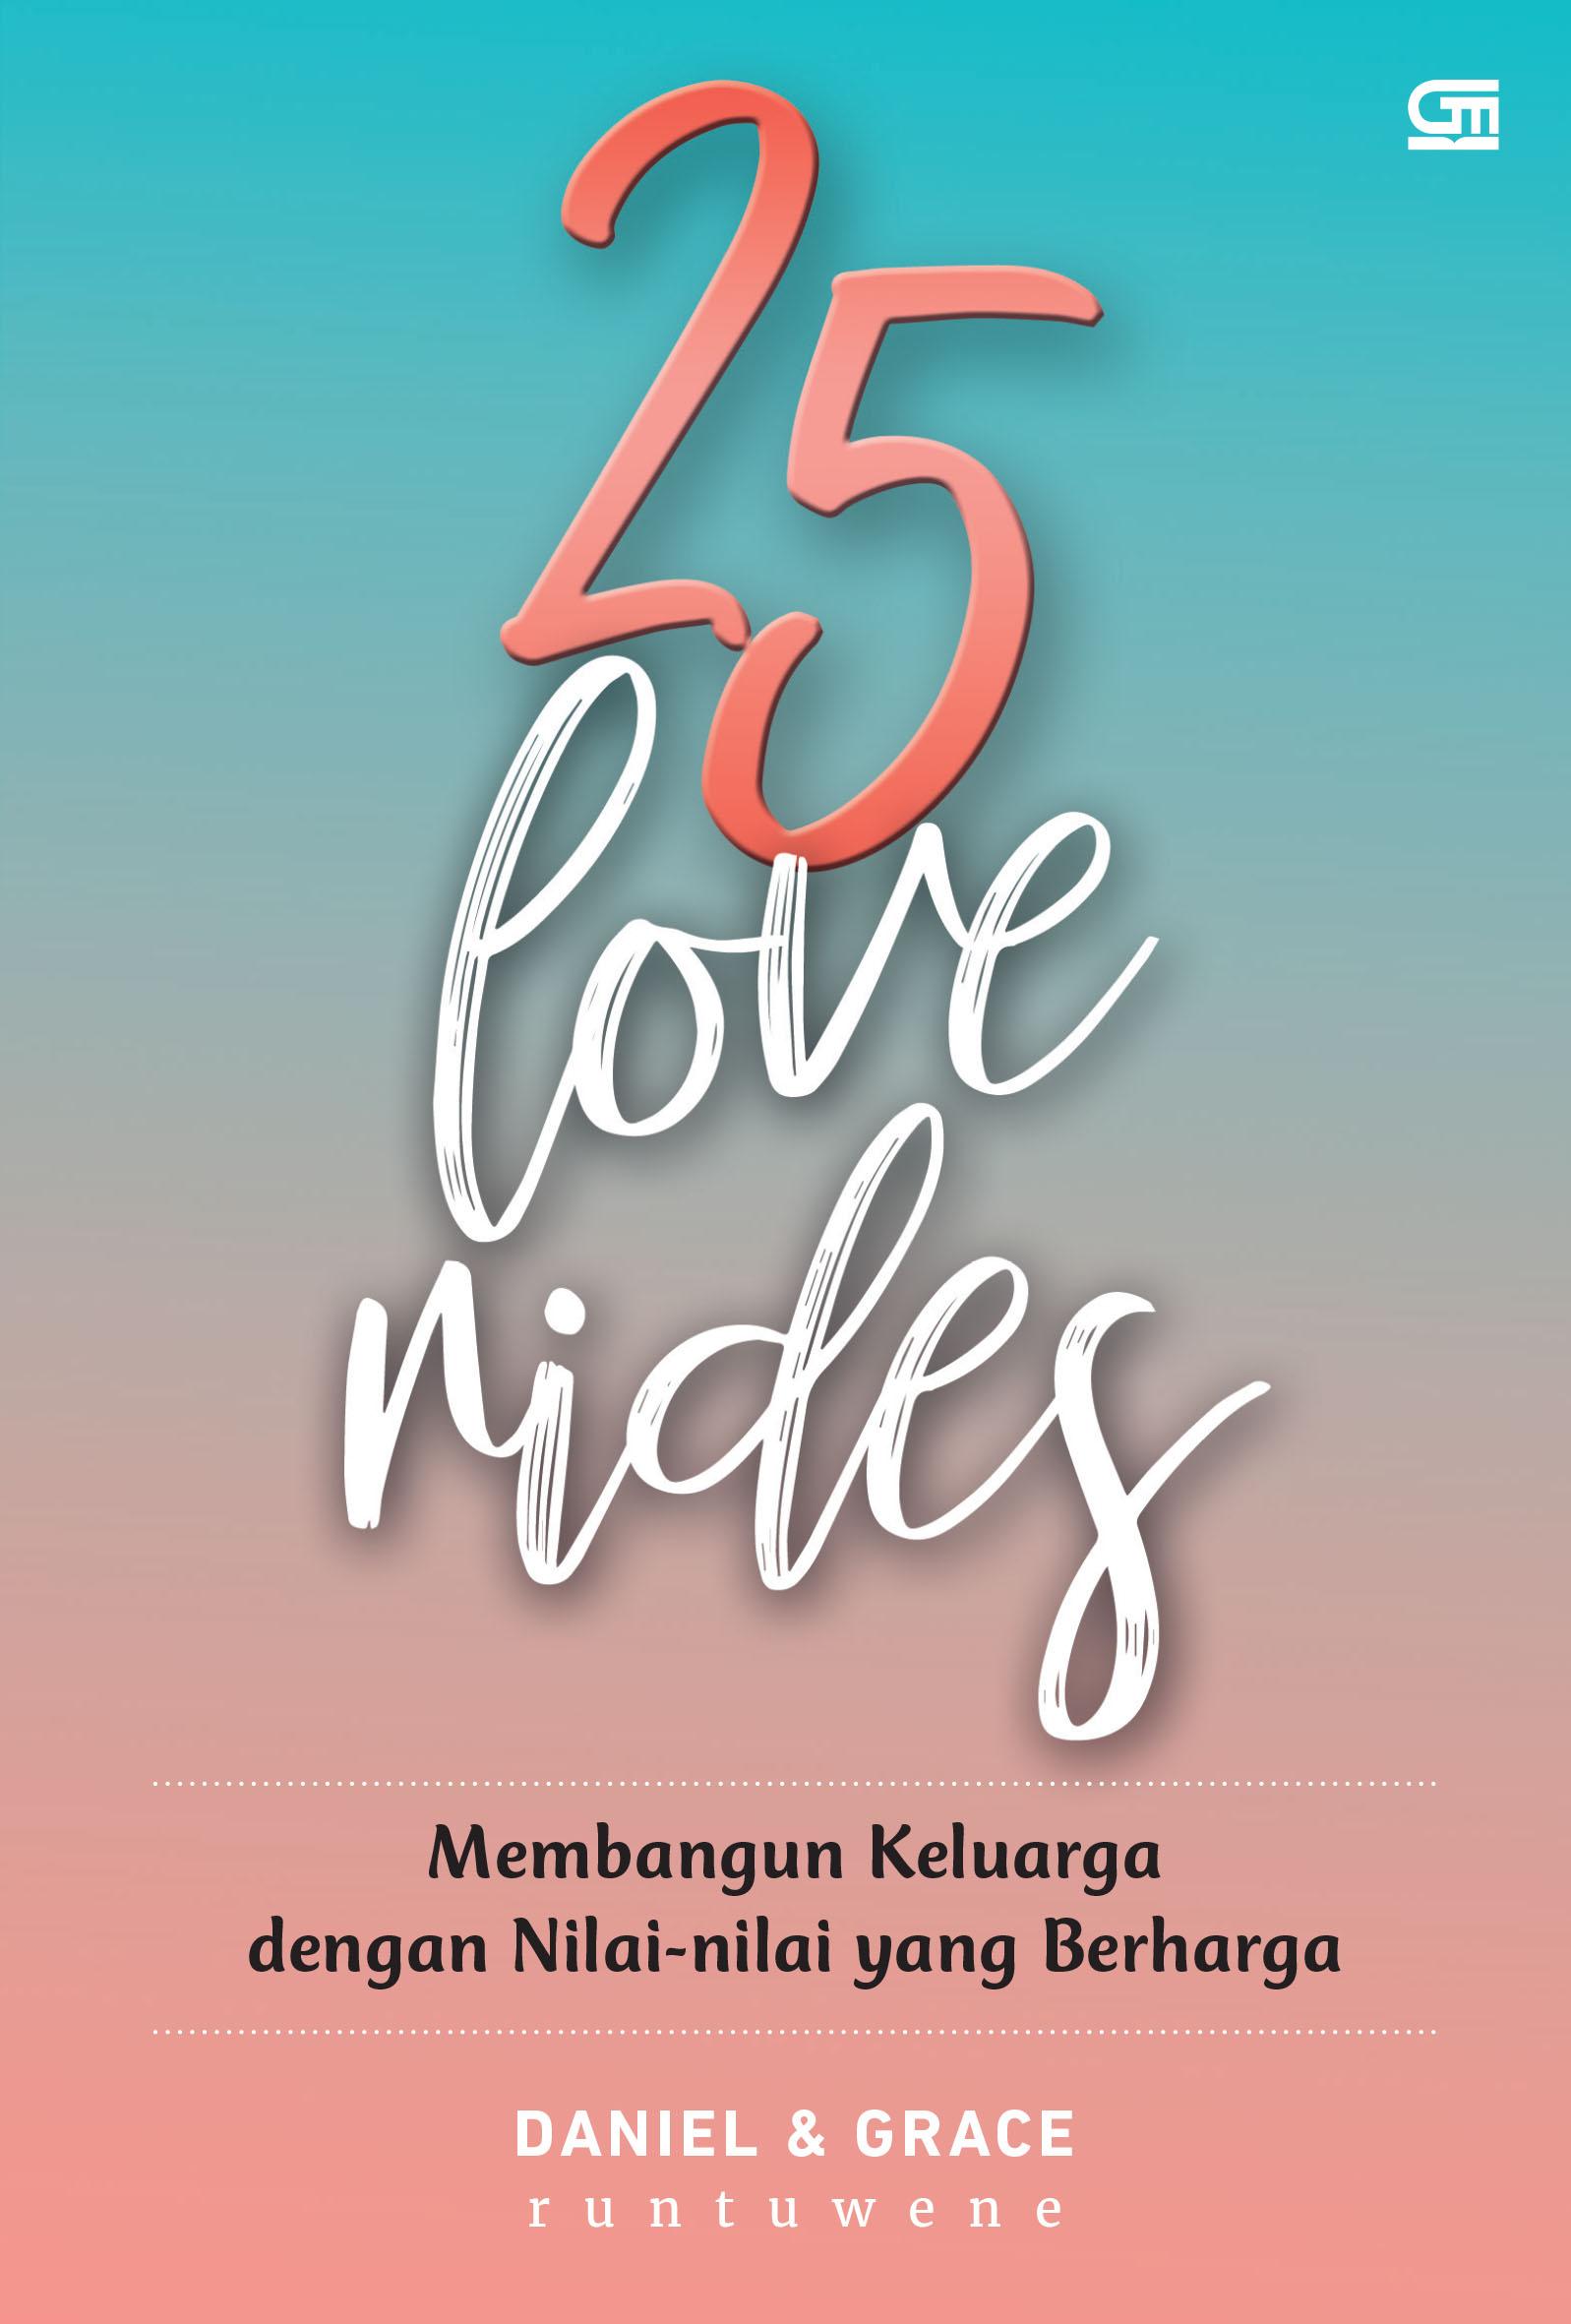 25 Love Rides